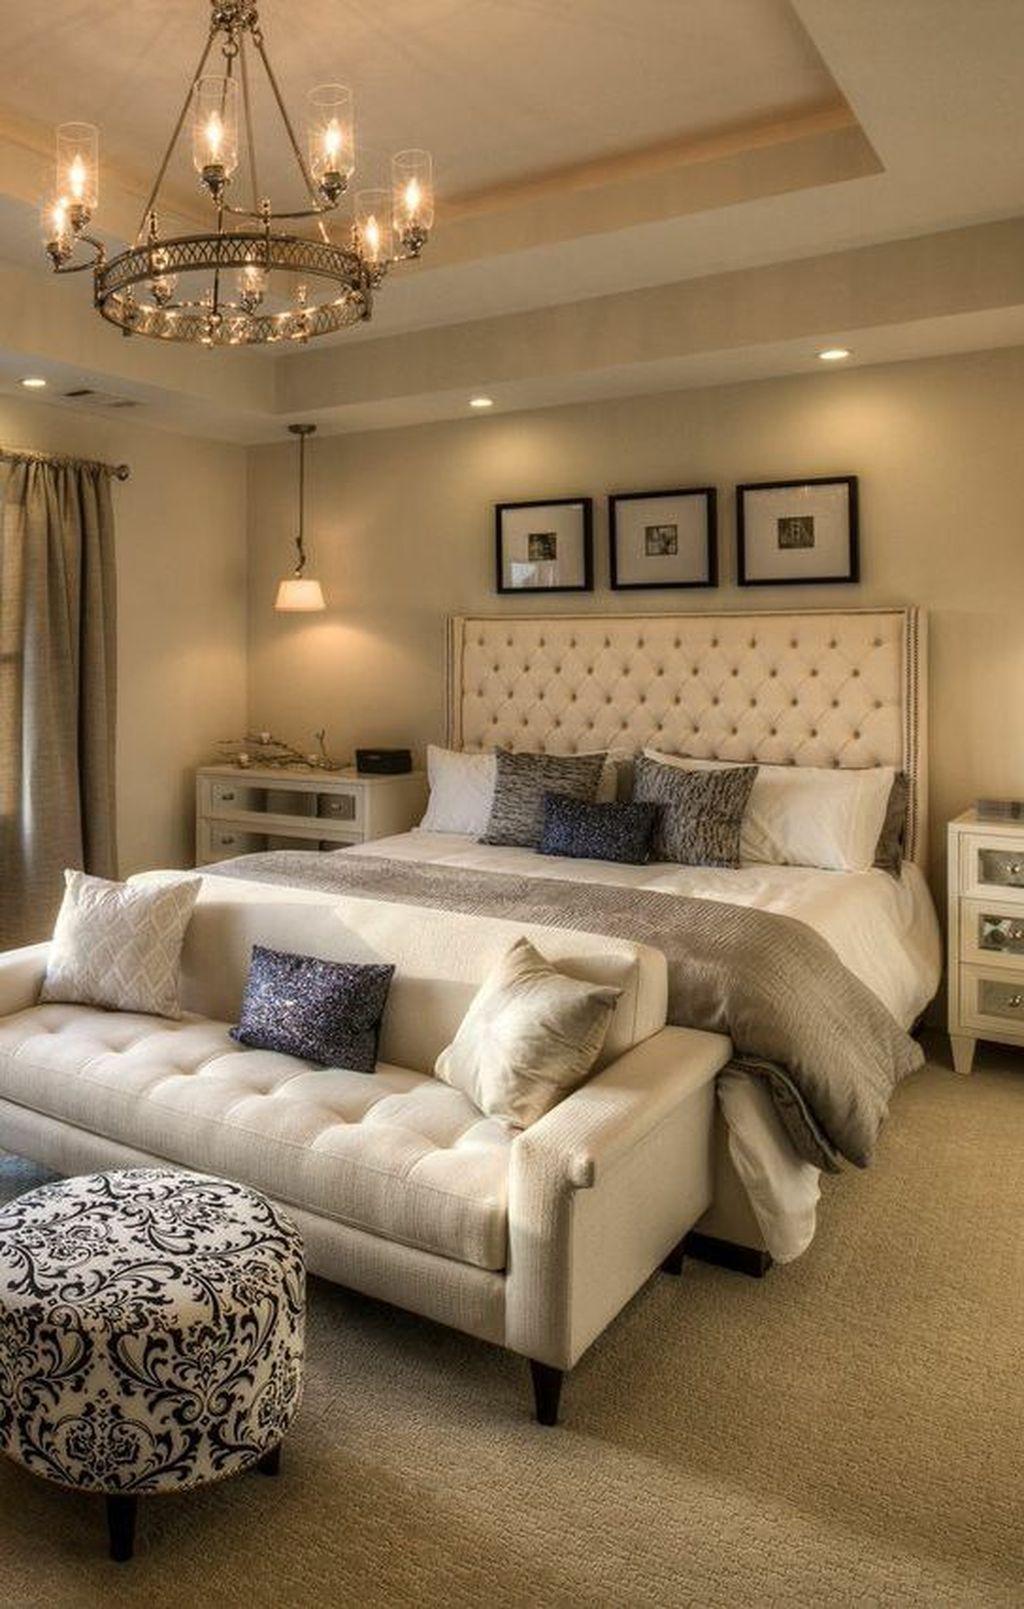 30 simple master bedroom design ideas for inspirations on dreamy luxurious master bedroom designs and decor ideas id=82601